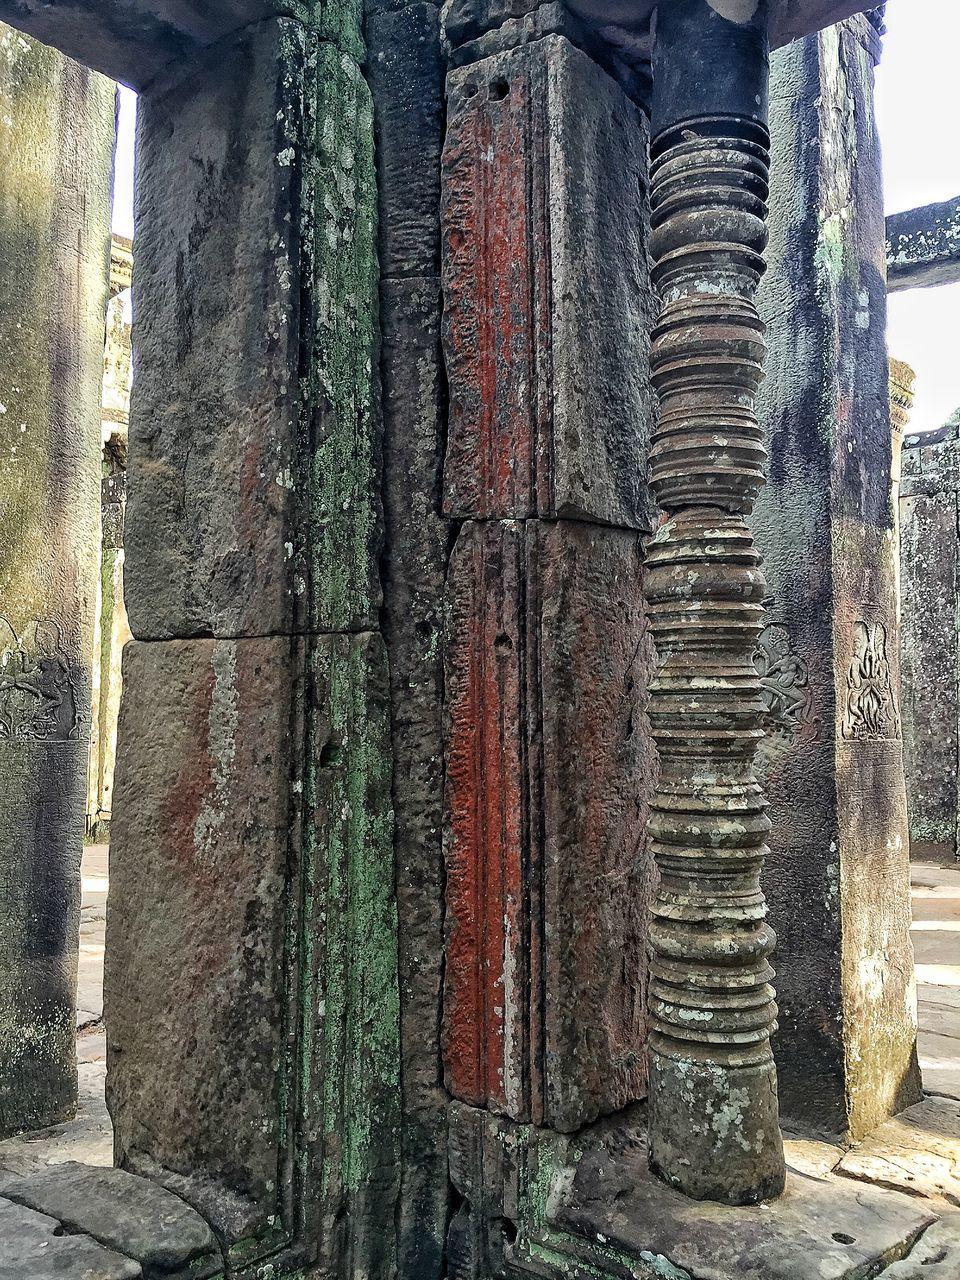 Architectural Columns At Old Ruins